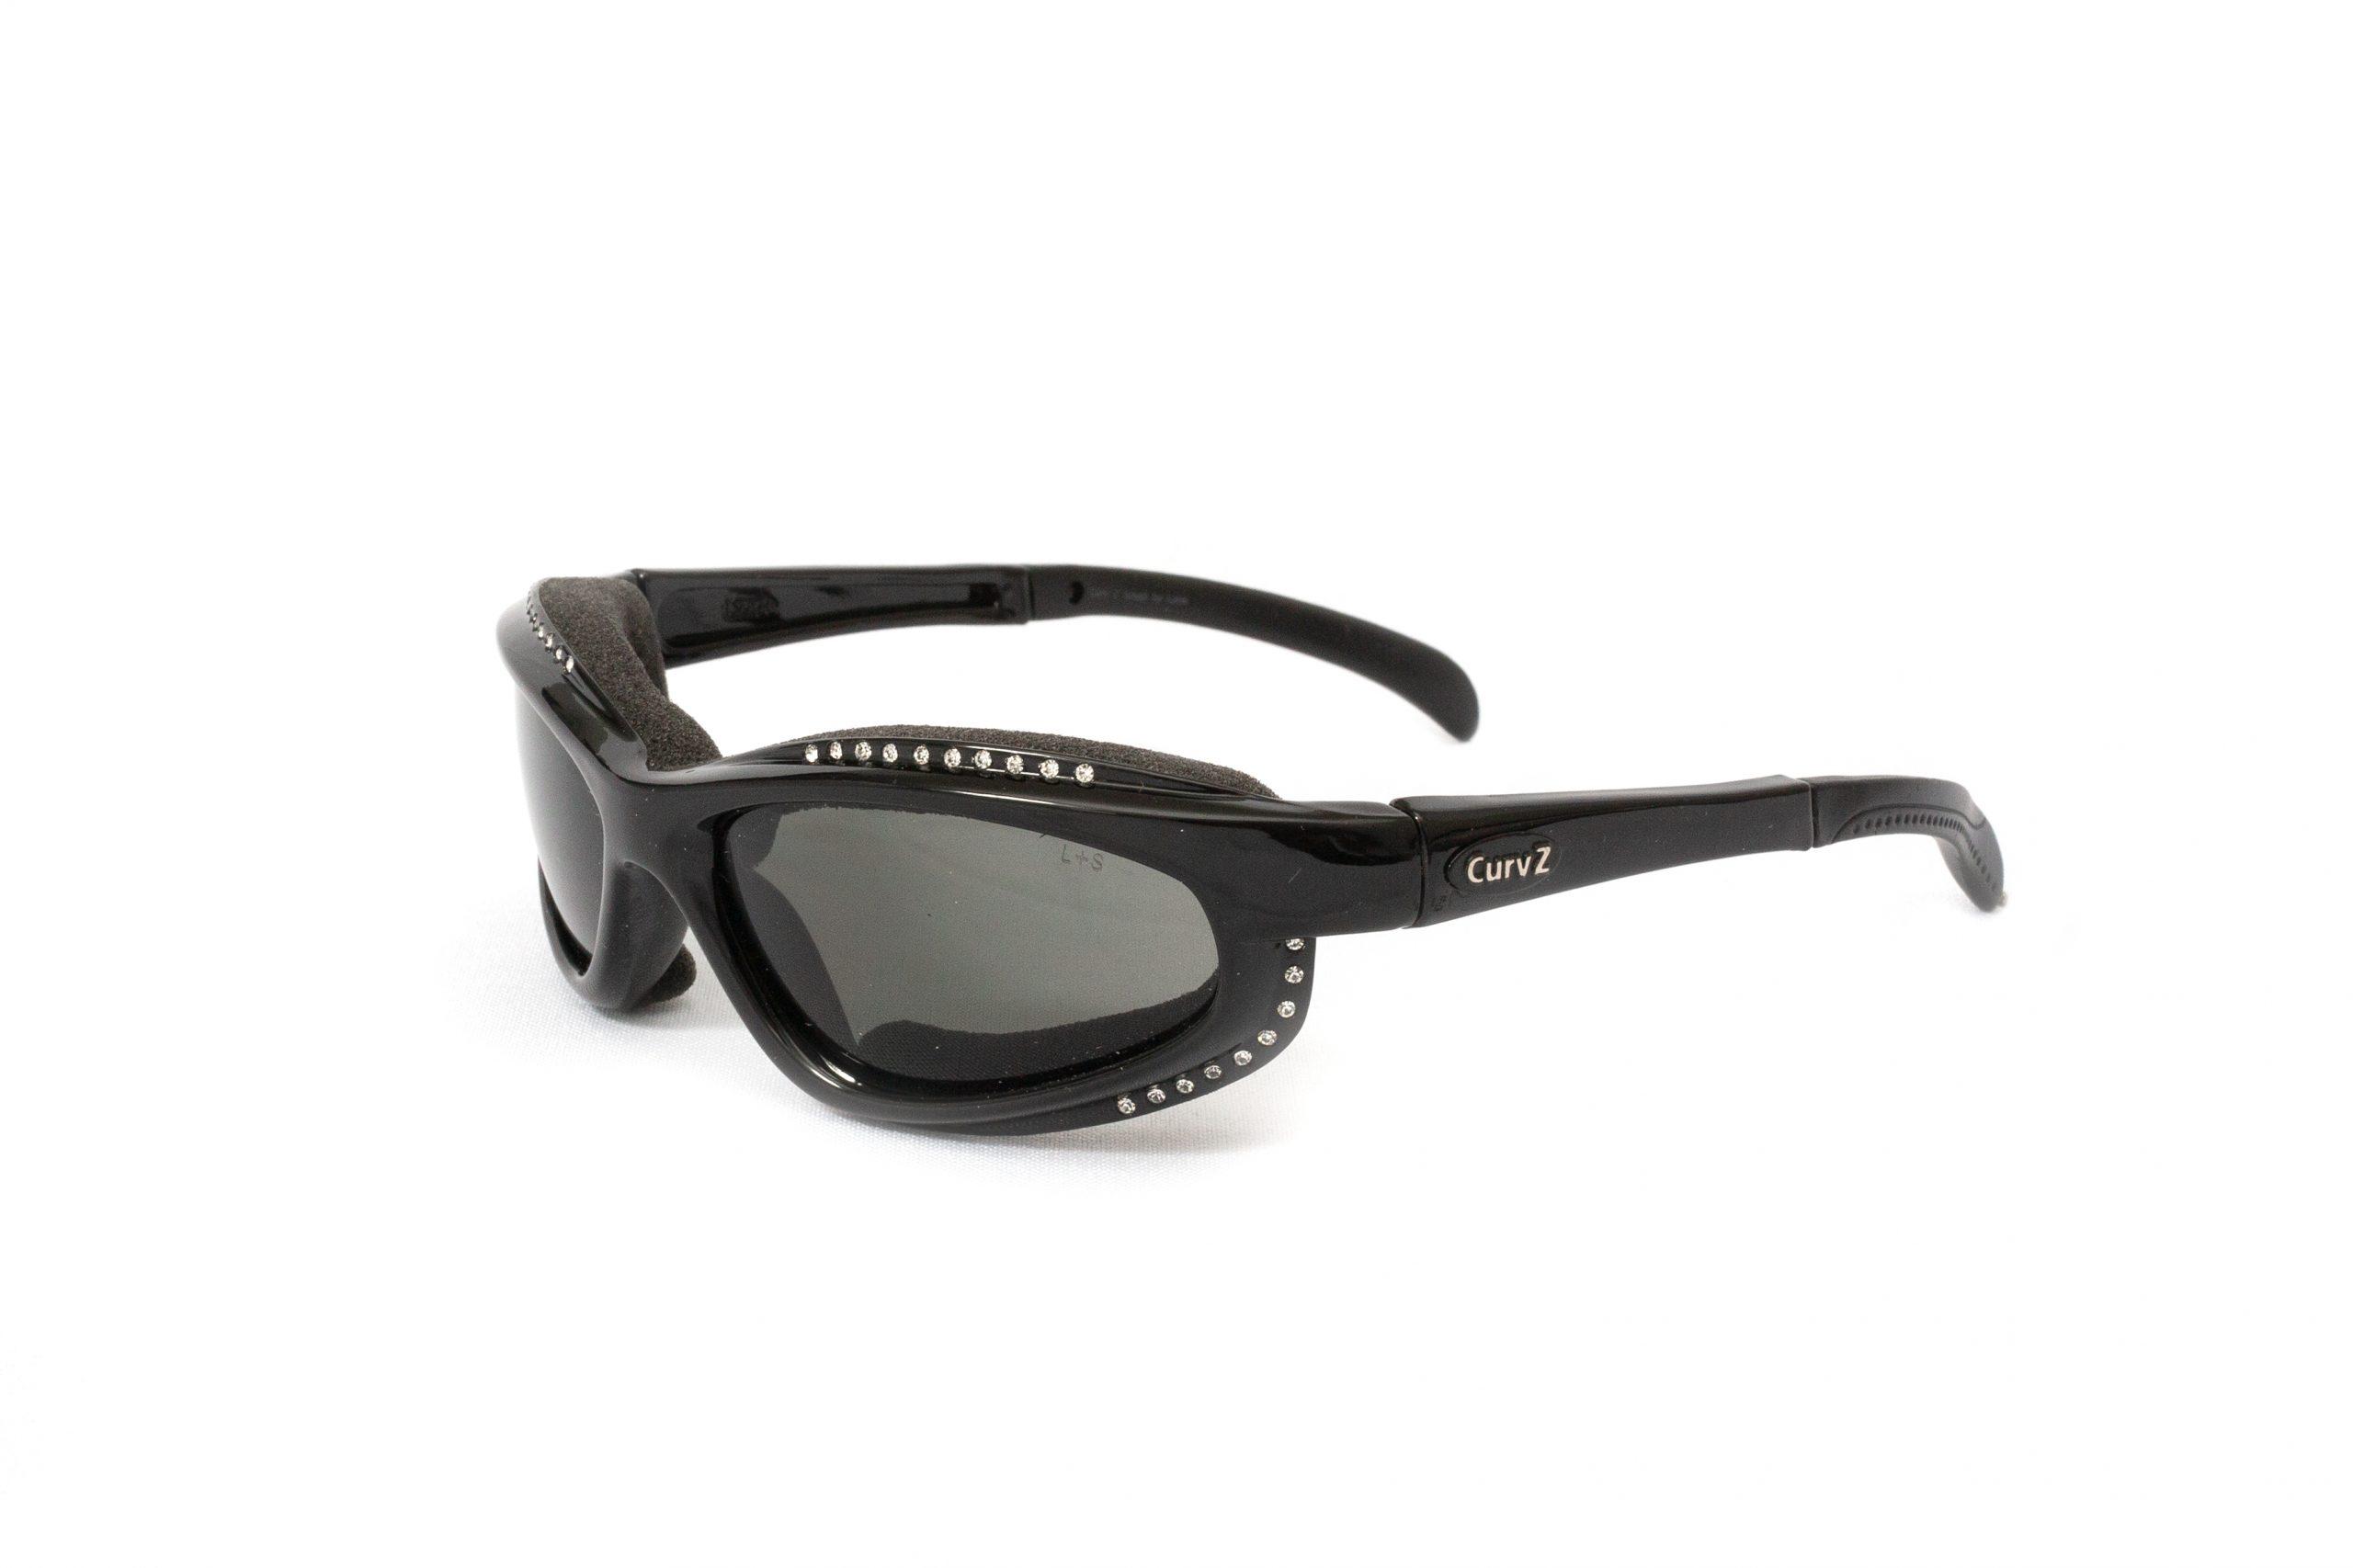 02-18 - CurvZ Small Rhinestone Sunglasses with Smoke Frames and Matte Black Frames with Rhinestones